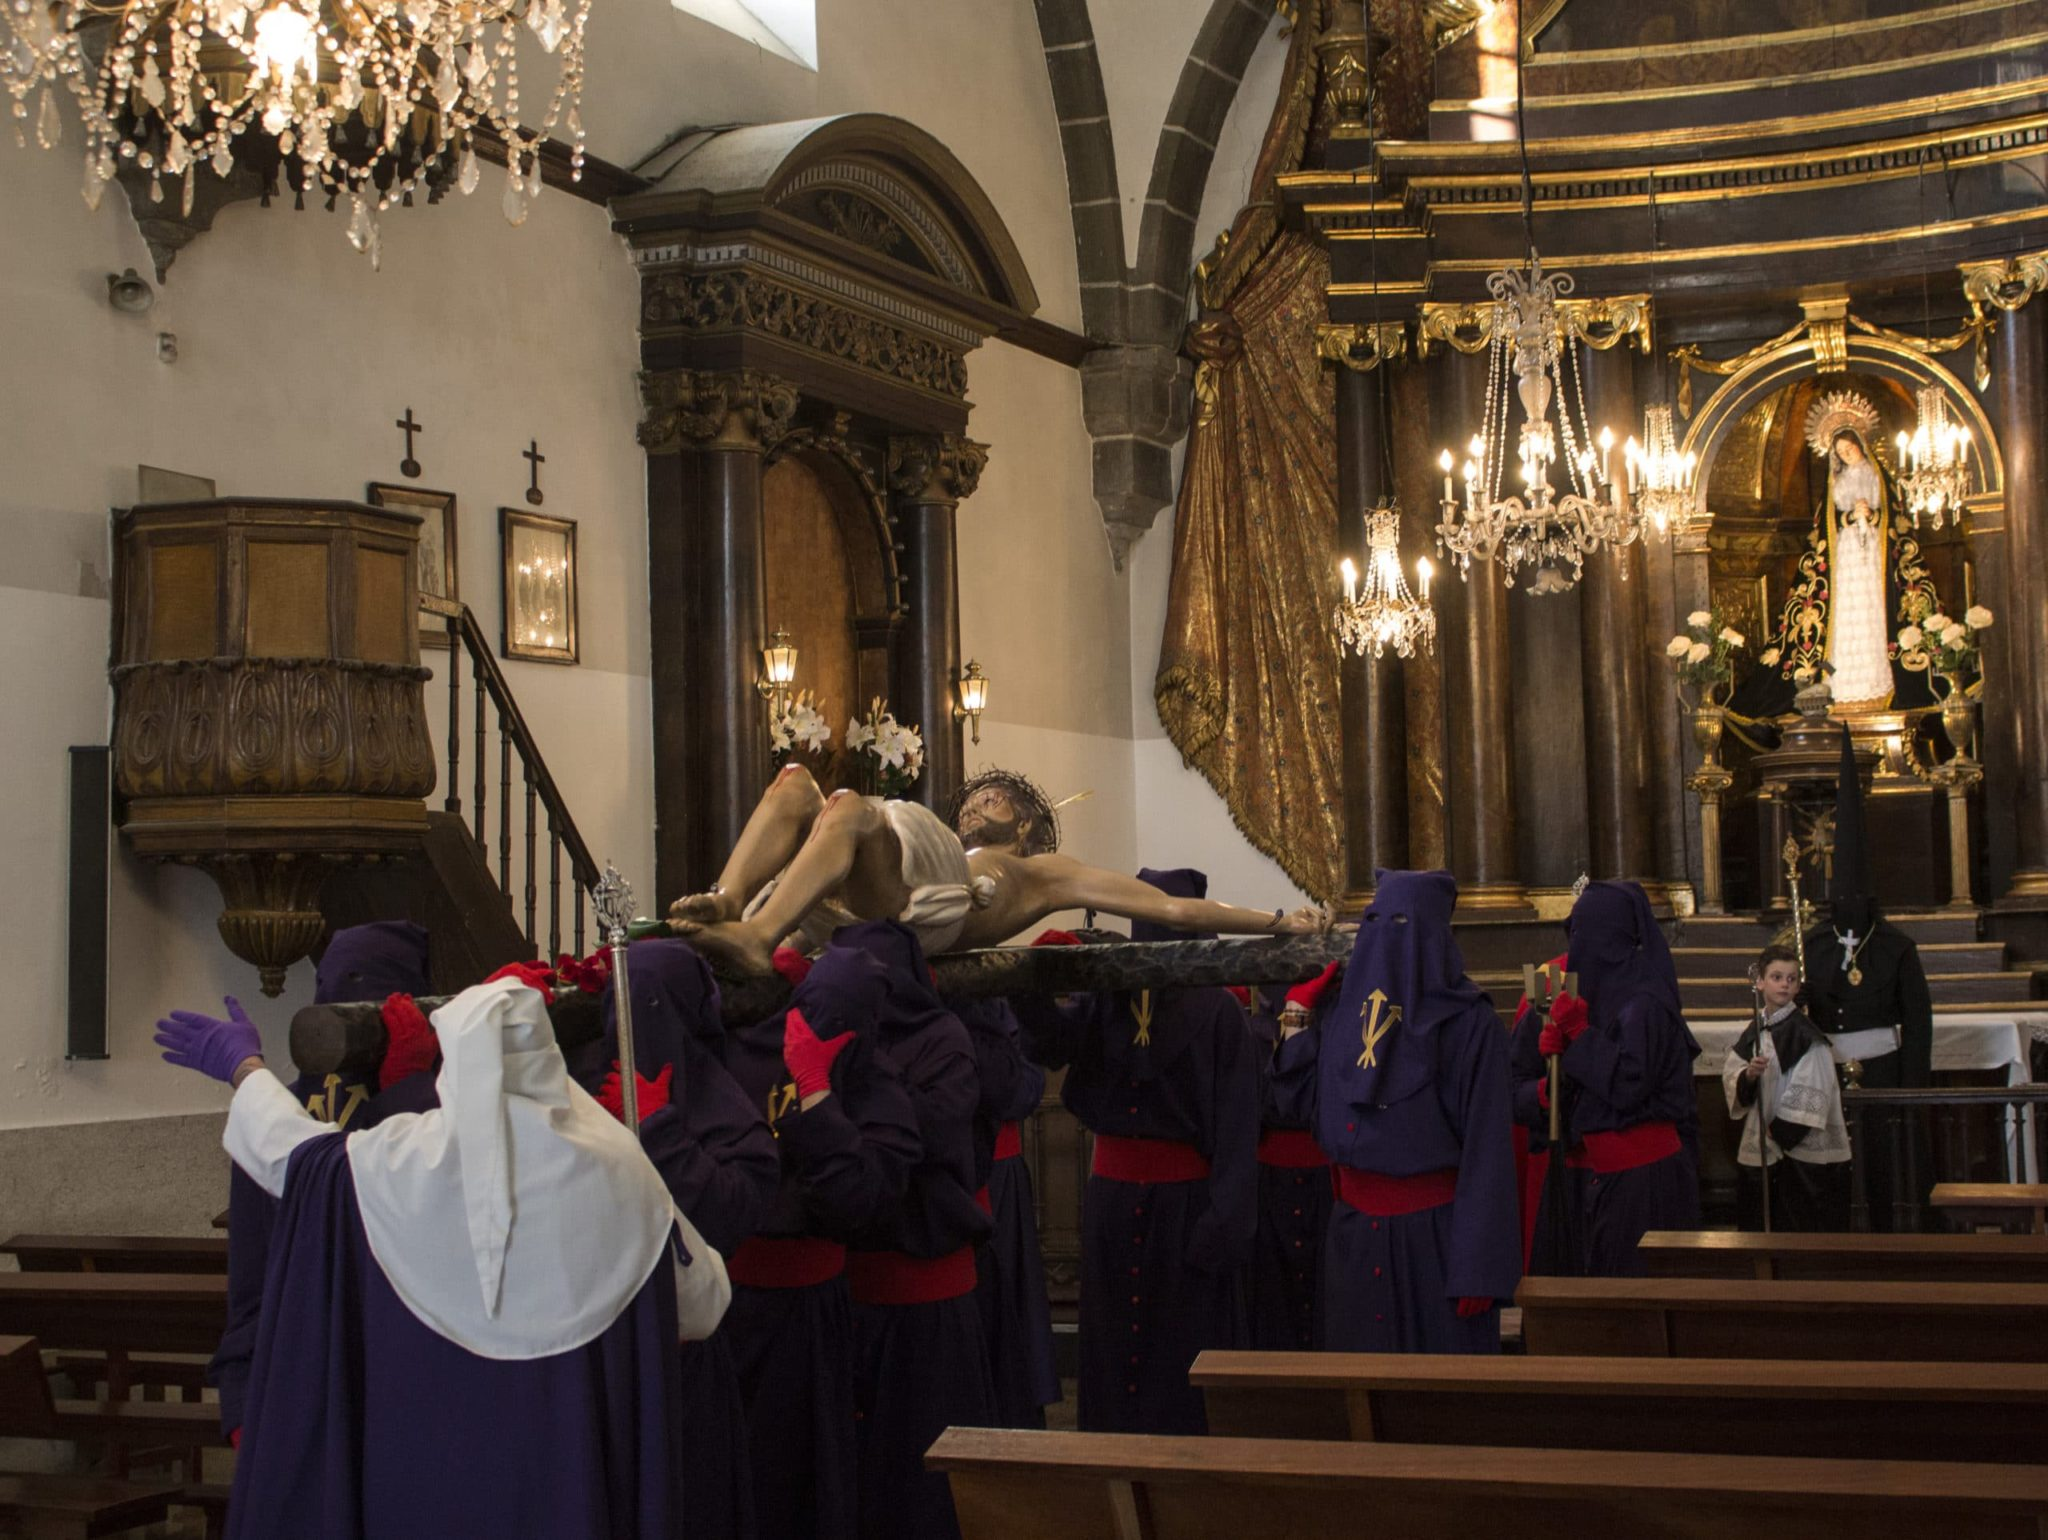 Capilla de la Orden Tercera, Soledad (Ferrol)